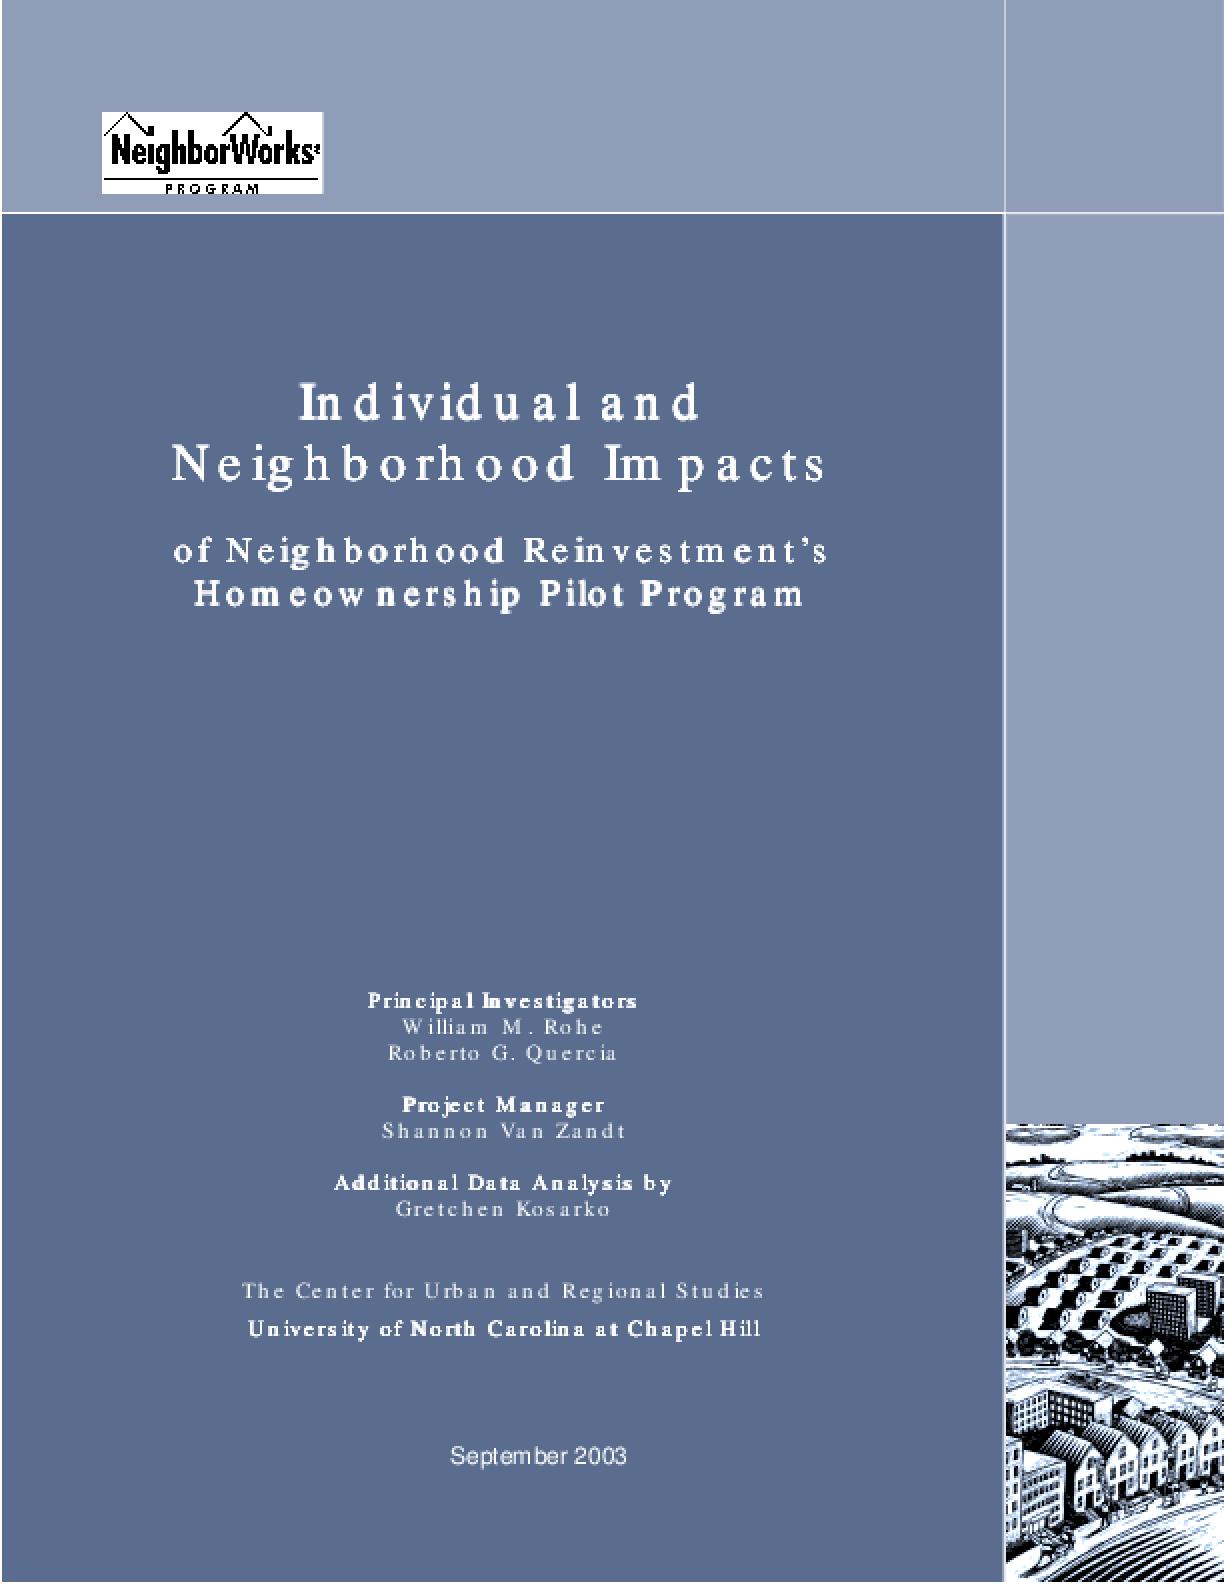 Individual and Neighborhood Impacts of Neighborhood Reinvestment's Homeownership Pilot Program